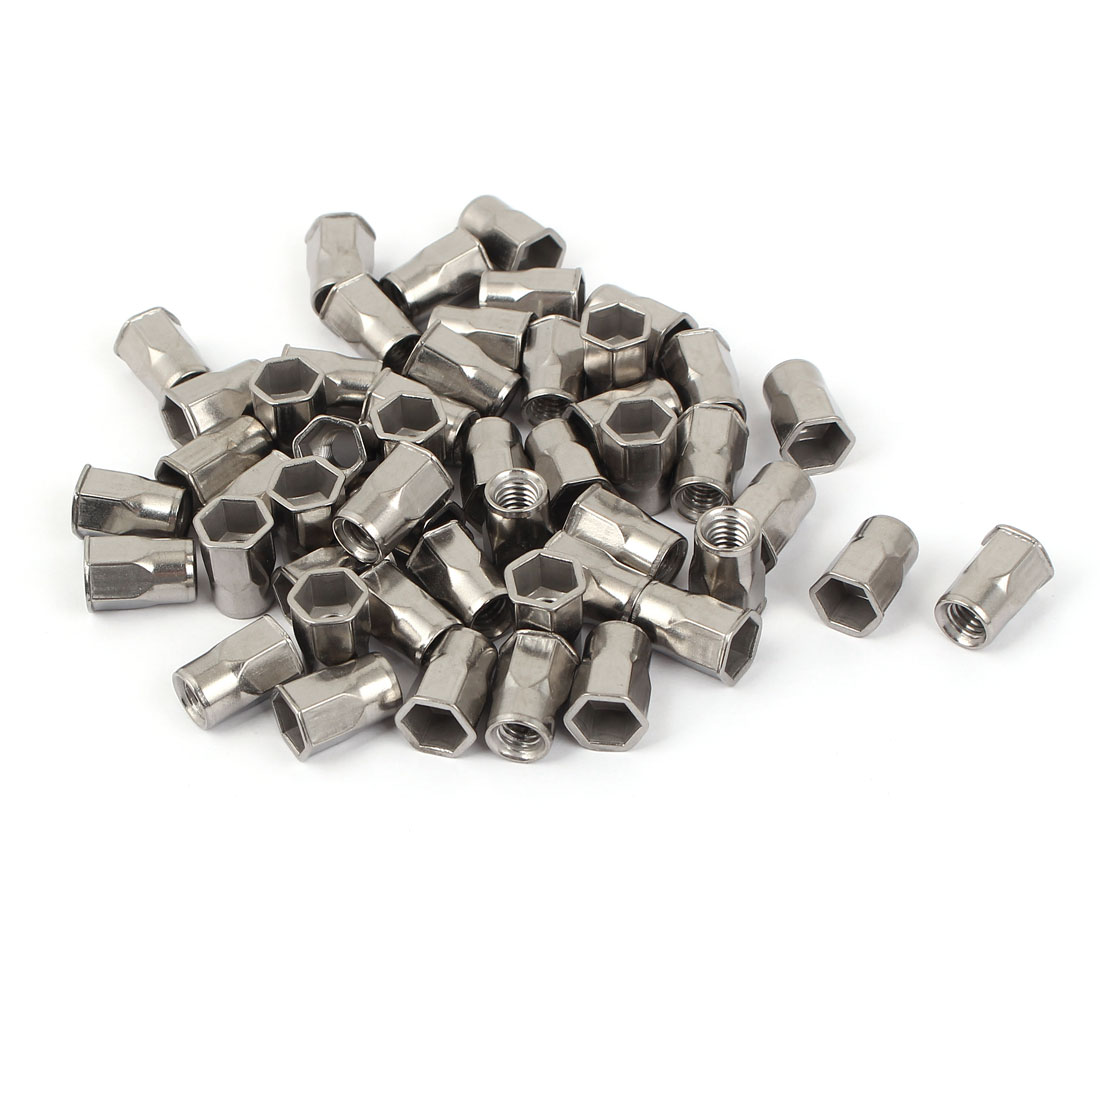 M6 Stainless Steel Hex Flat Head Rivet Nut Insert Nutsert 50pcs